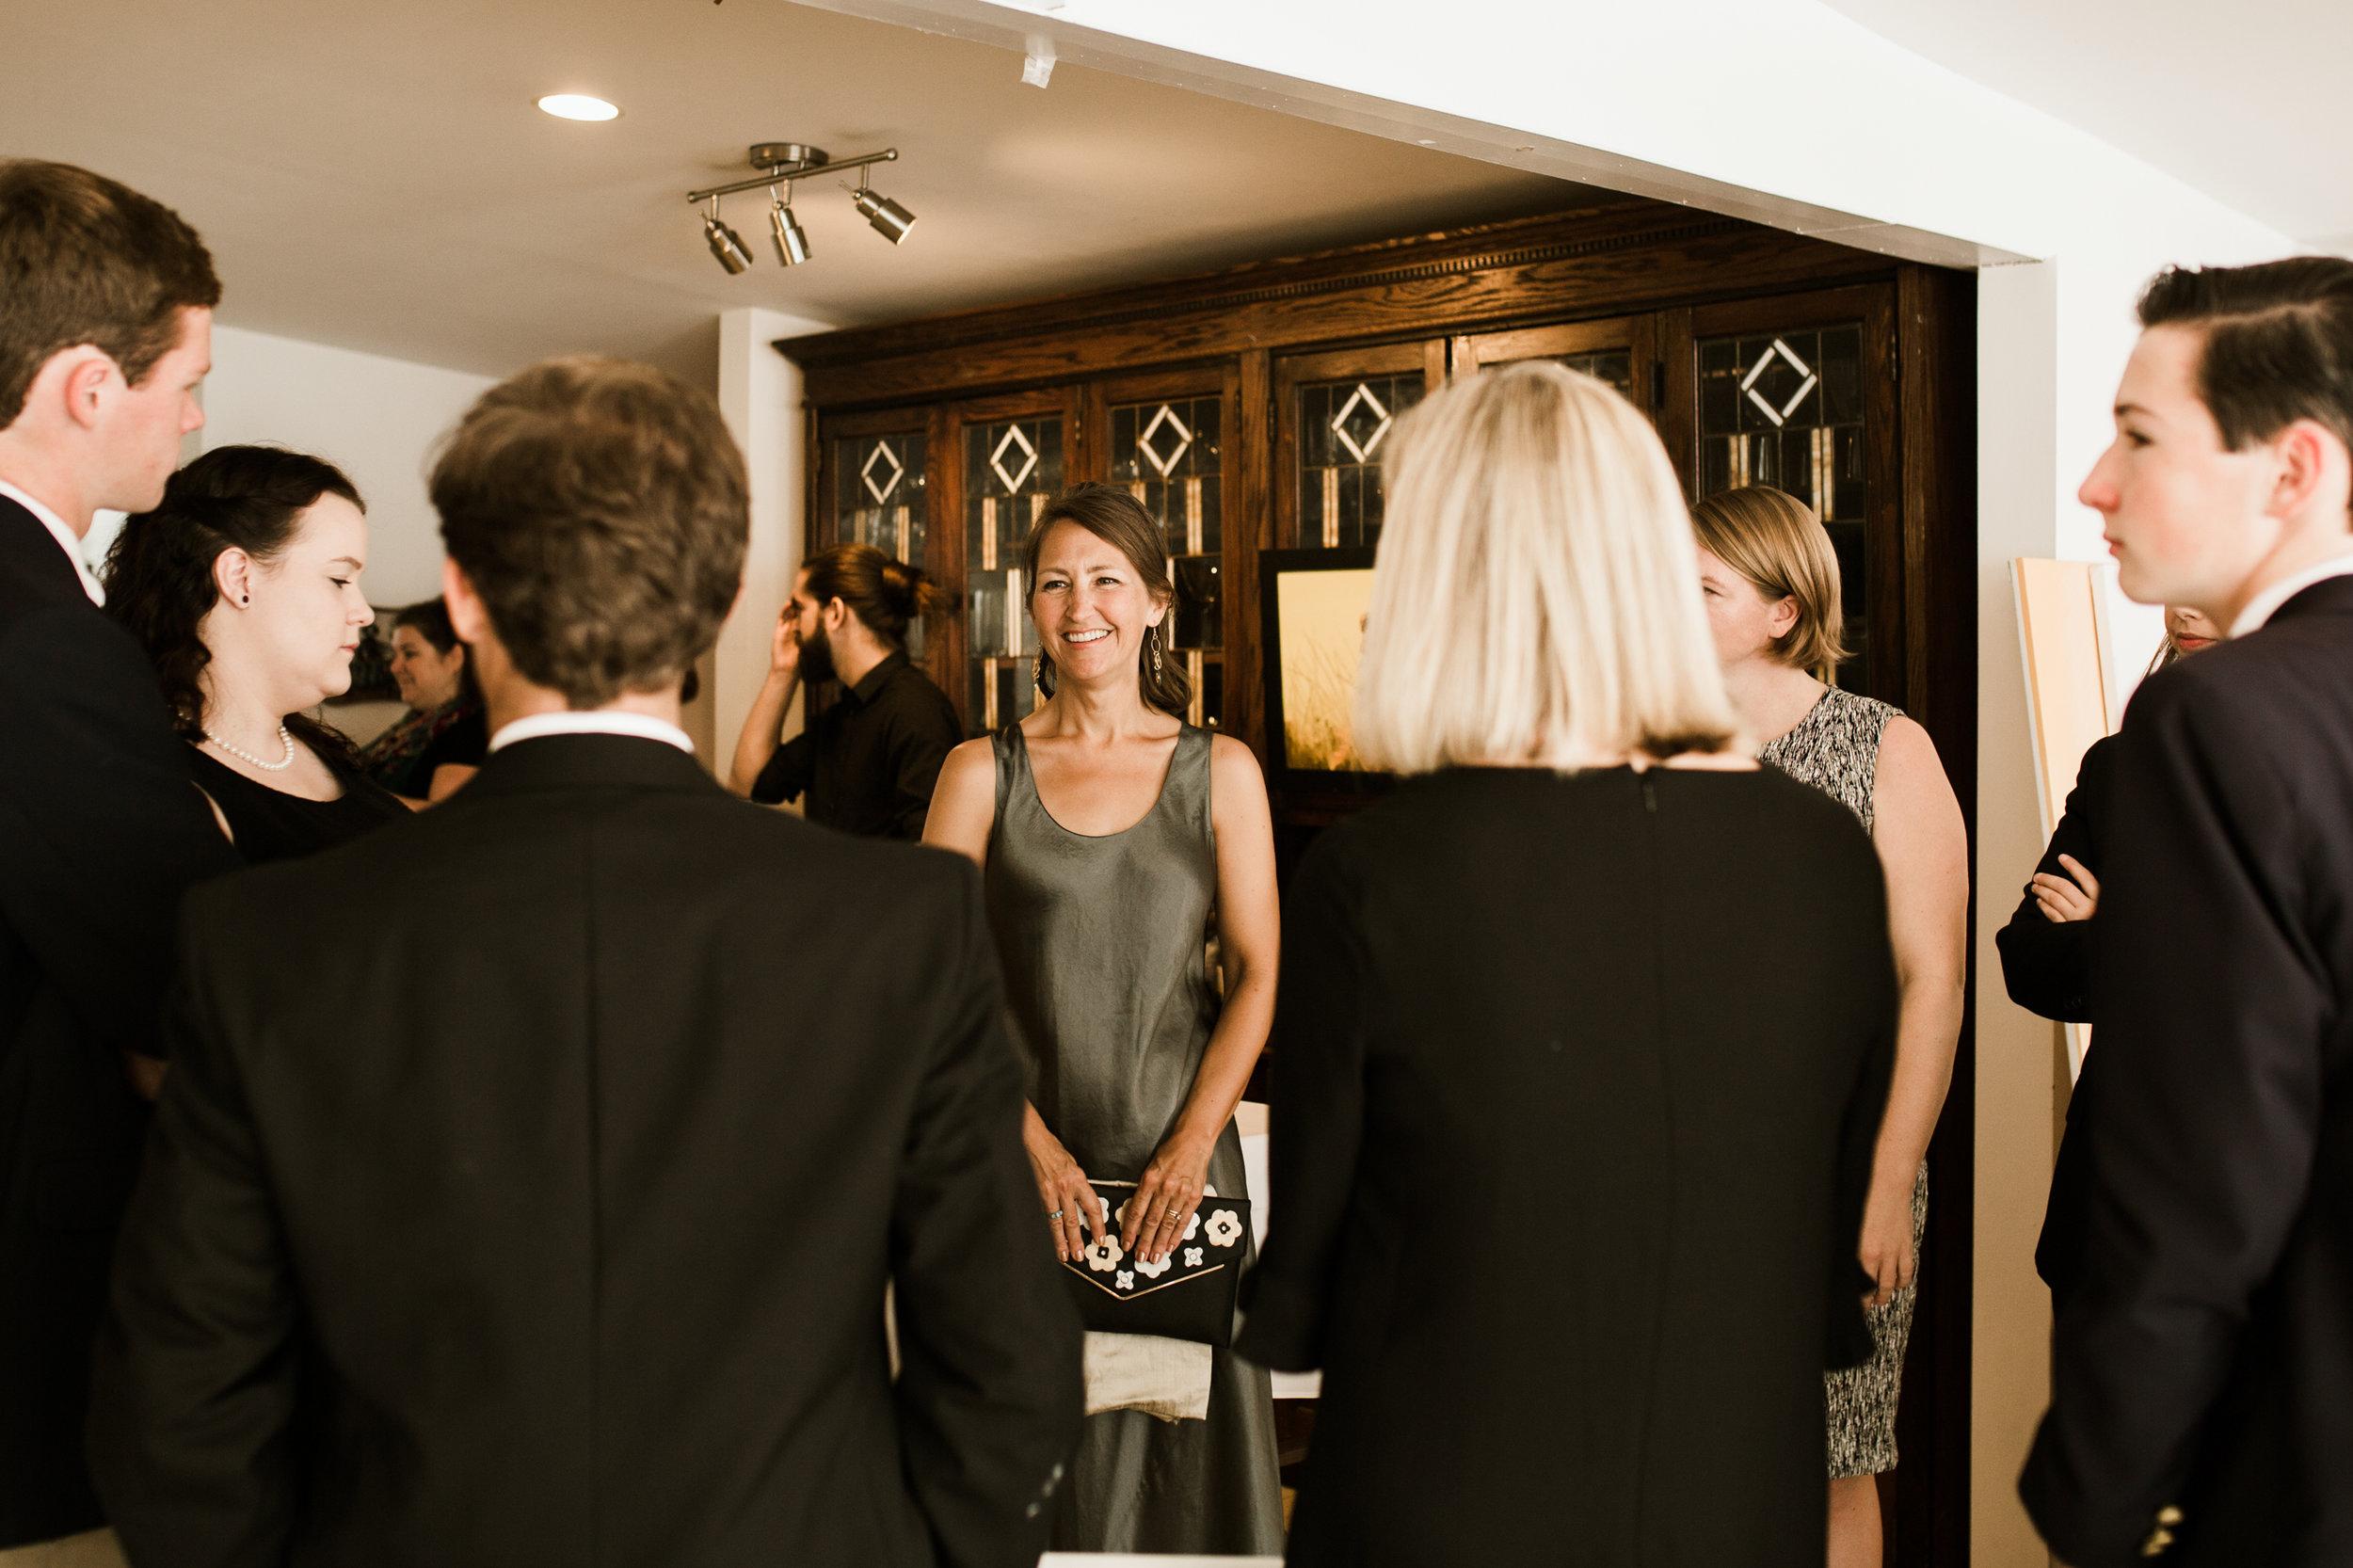 Kentucky Wedding Louisville Wedding Photographer 2018 Crystal Ludwick Photo Louisville Wedding Photographer Kentucky Wedding Photographer (6 of 105).jpg